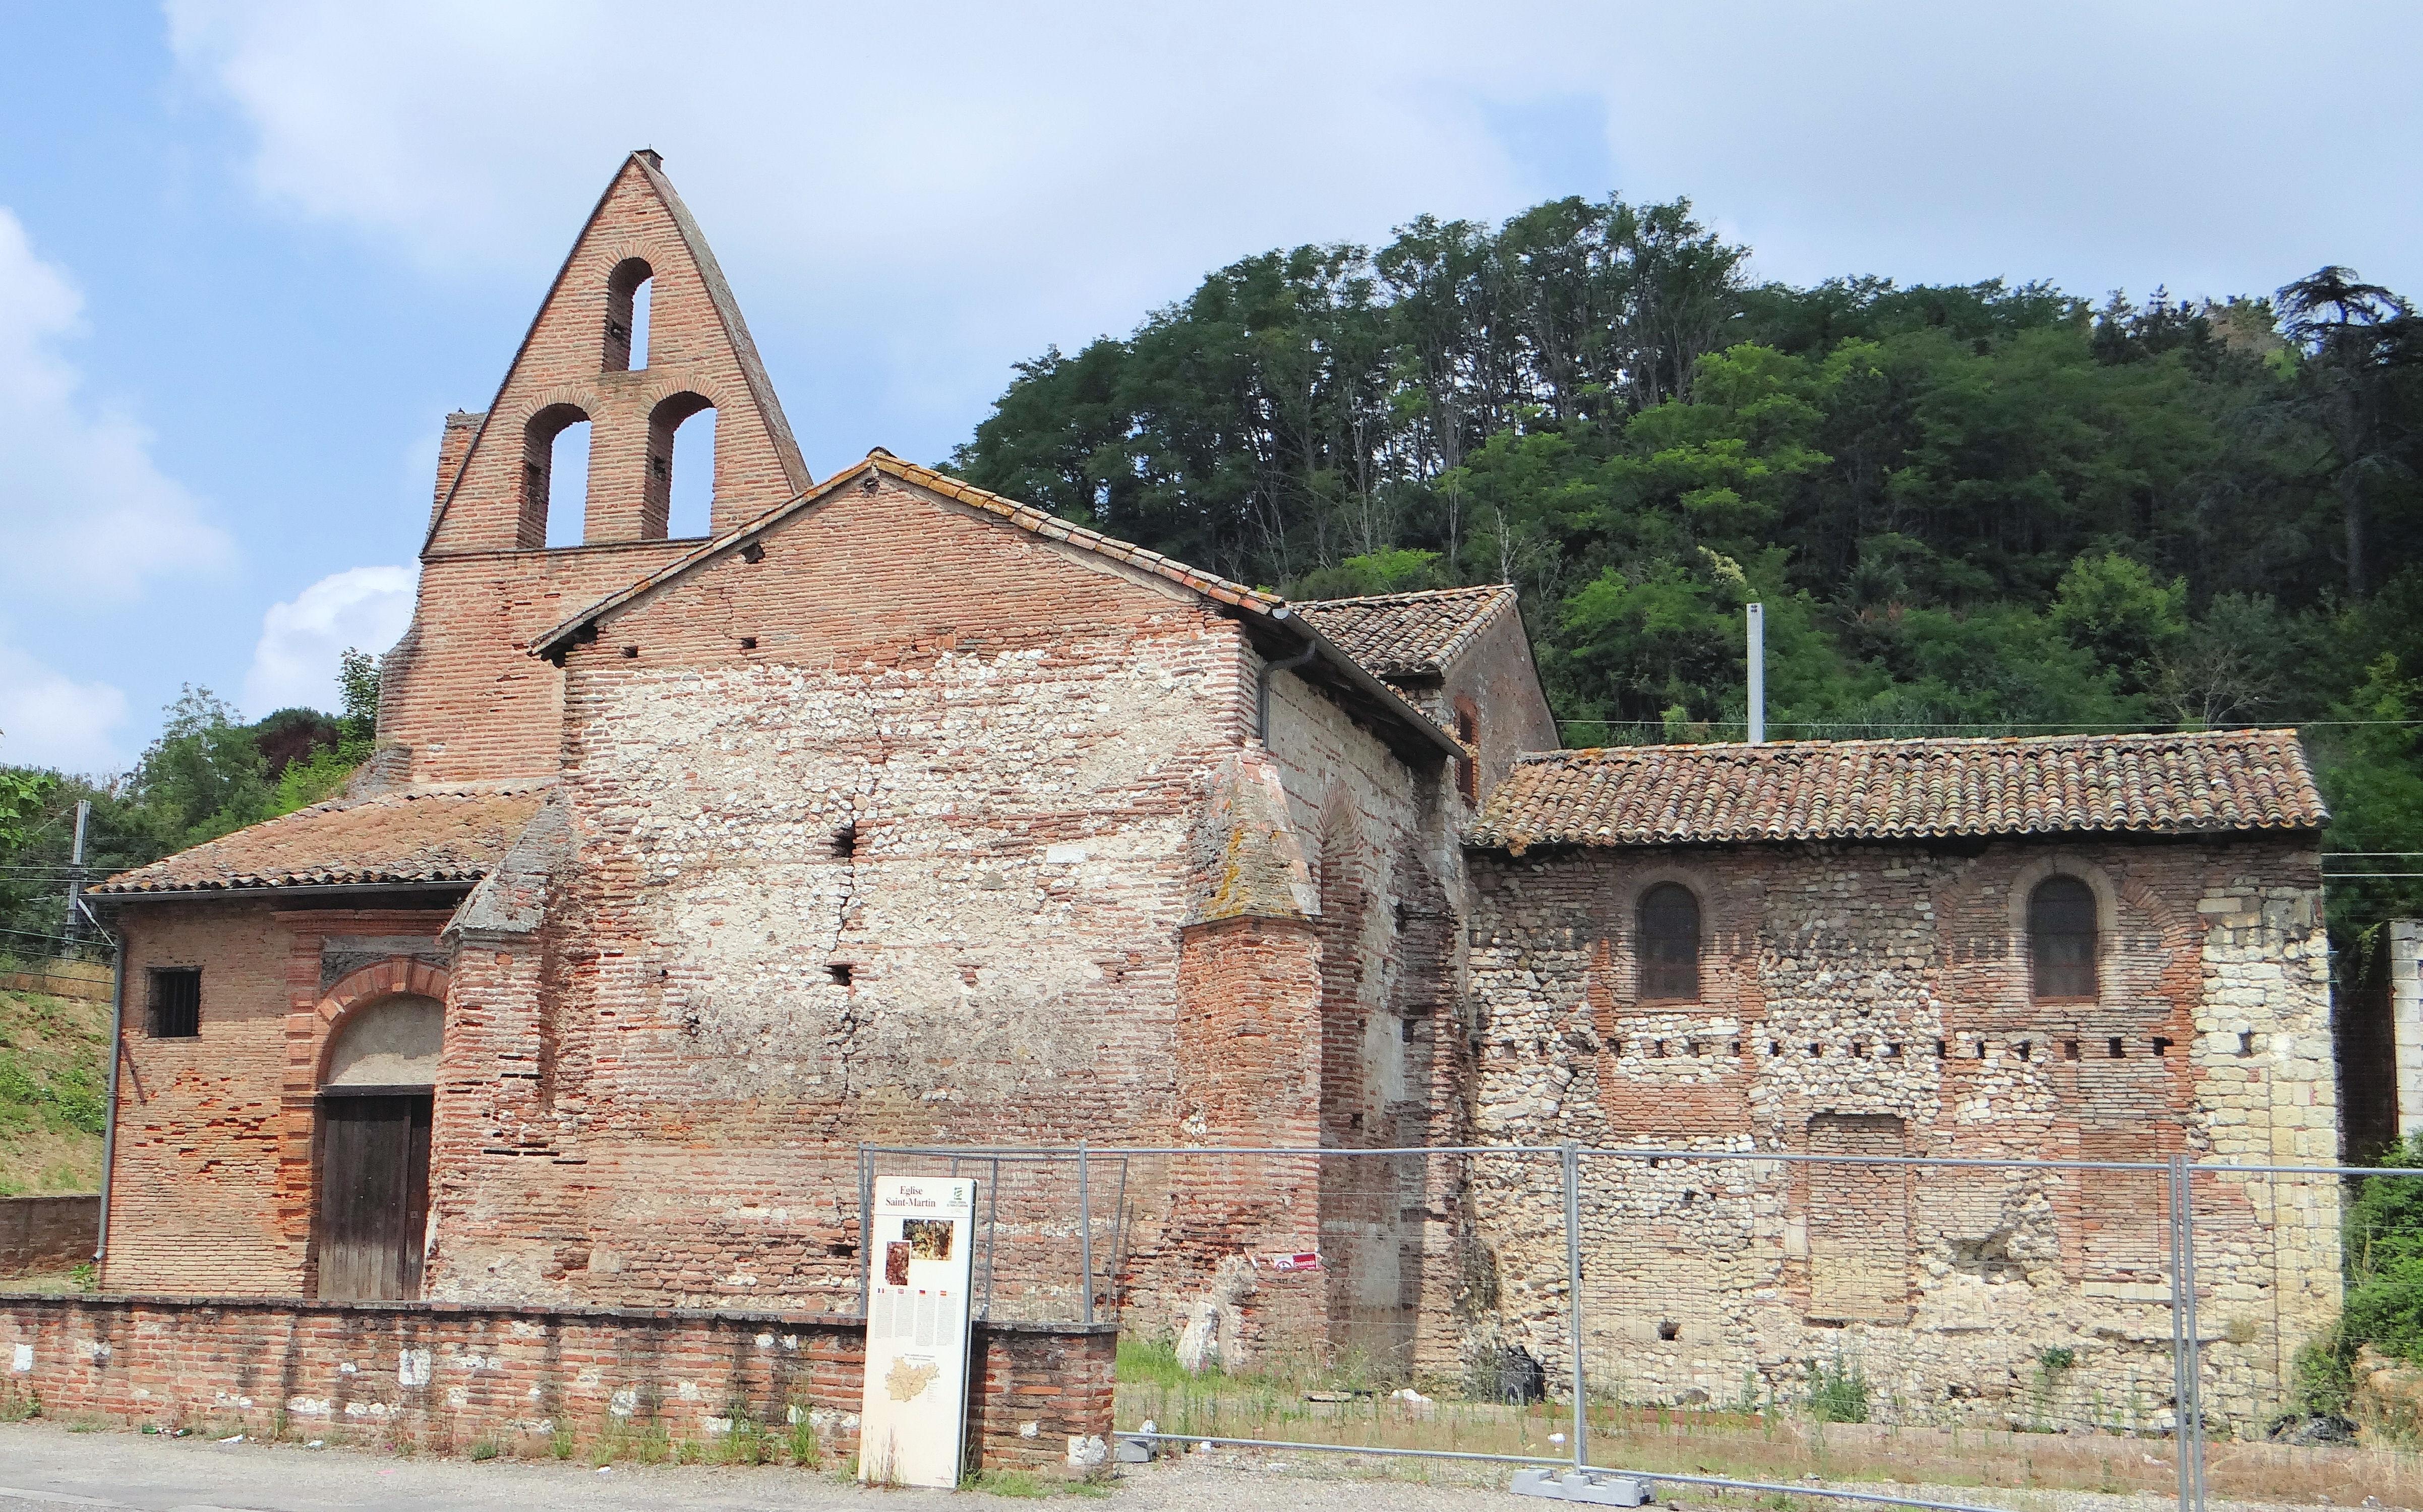 église Saint Martin de Moissac sur Wikipedia : https://fr.wikipedia.org/wiki/%C3%89glise_Saint-Martin_de_Moissac